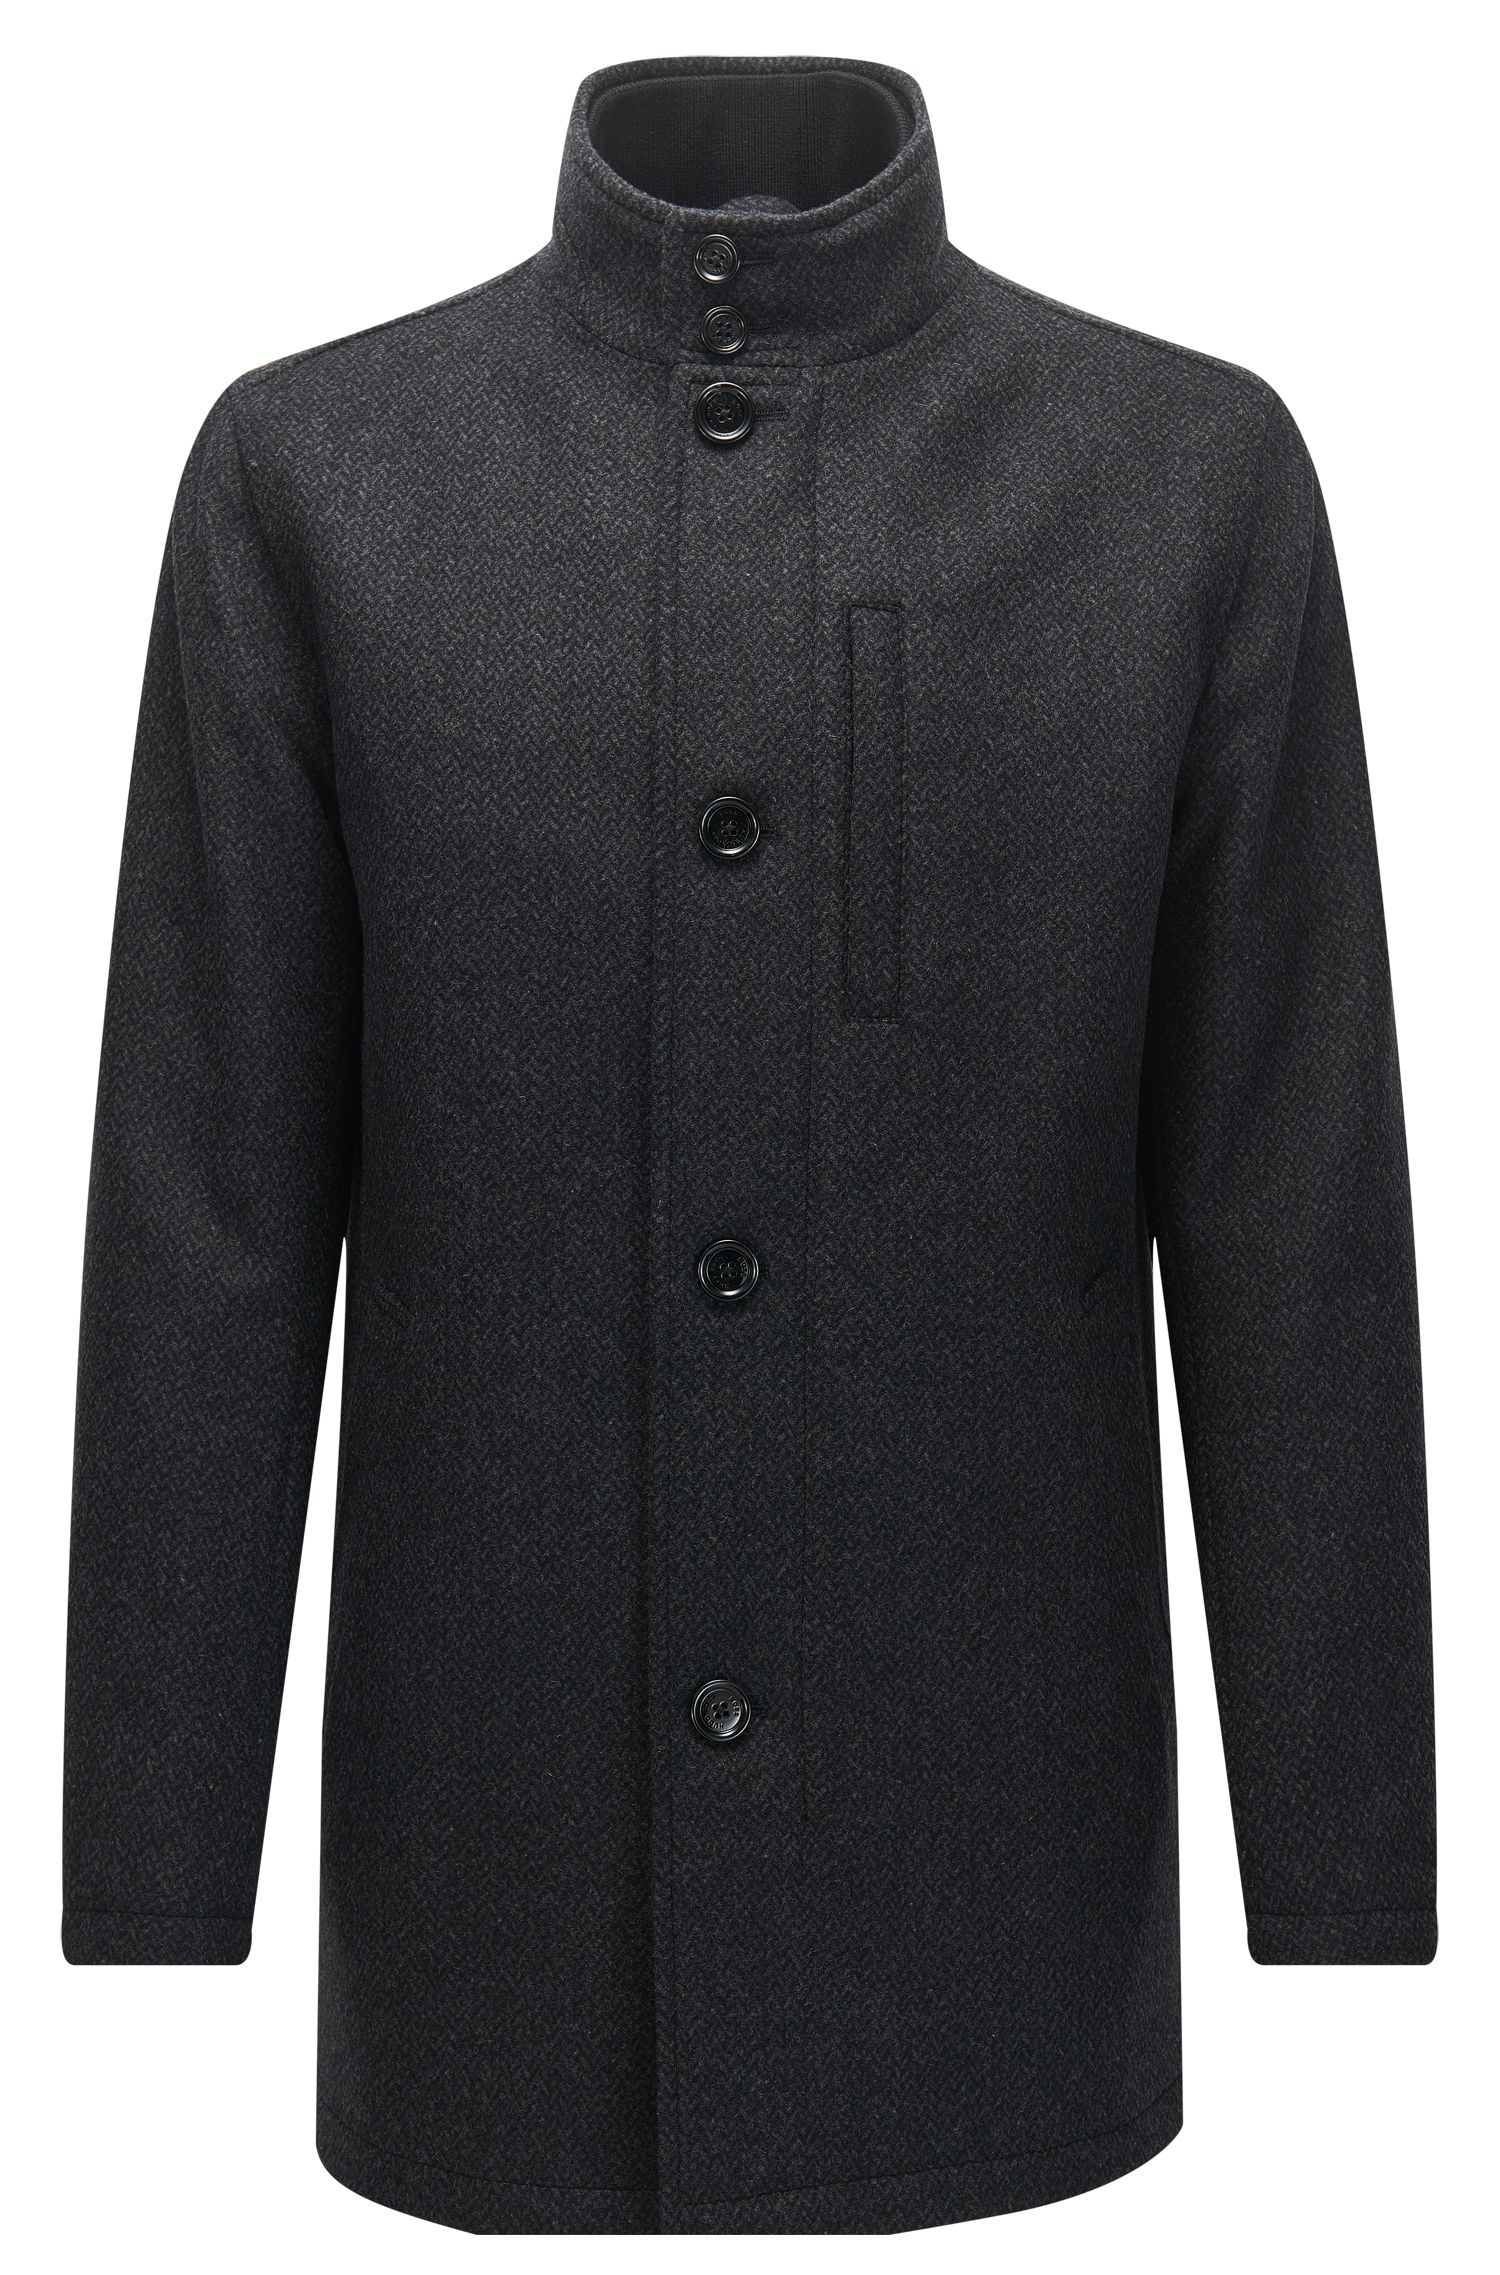 Wool Blend Jacket | Camron